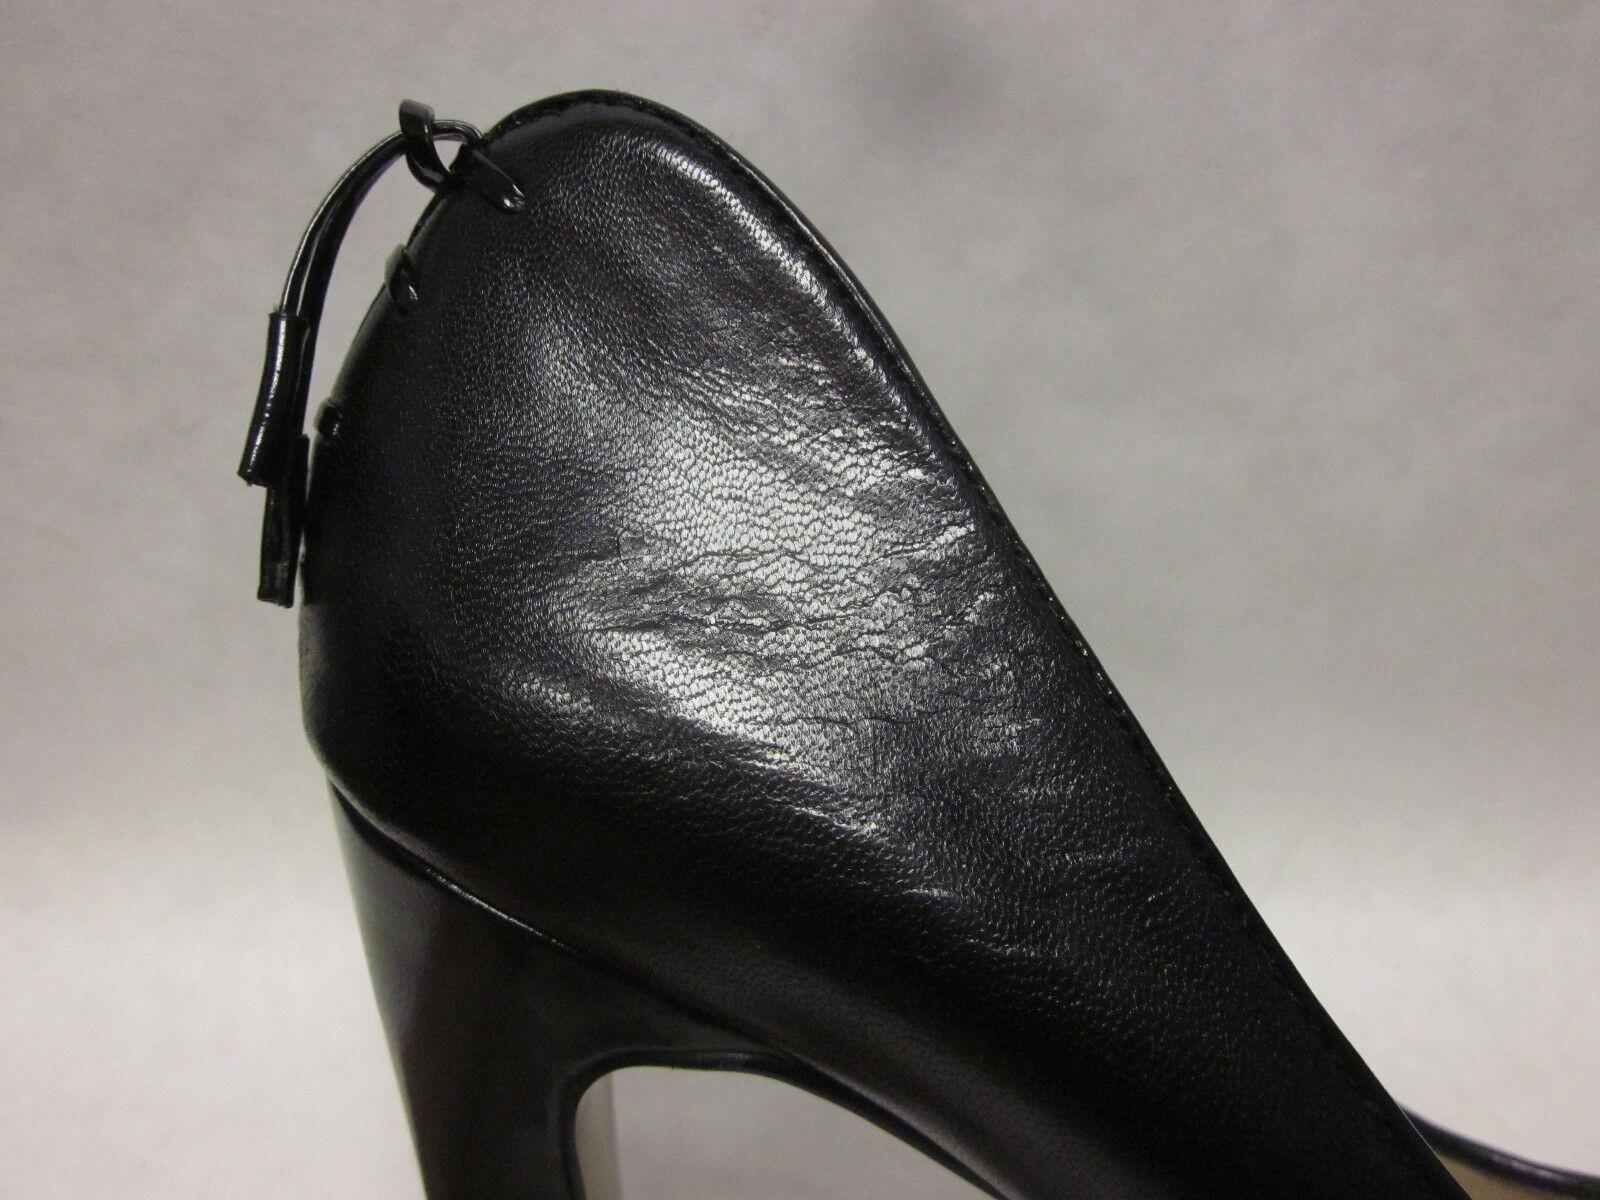 Nine Nine Nine West Heartache Black Open Toe Platform Pump - size 8.5 877146